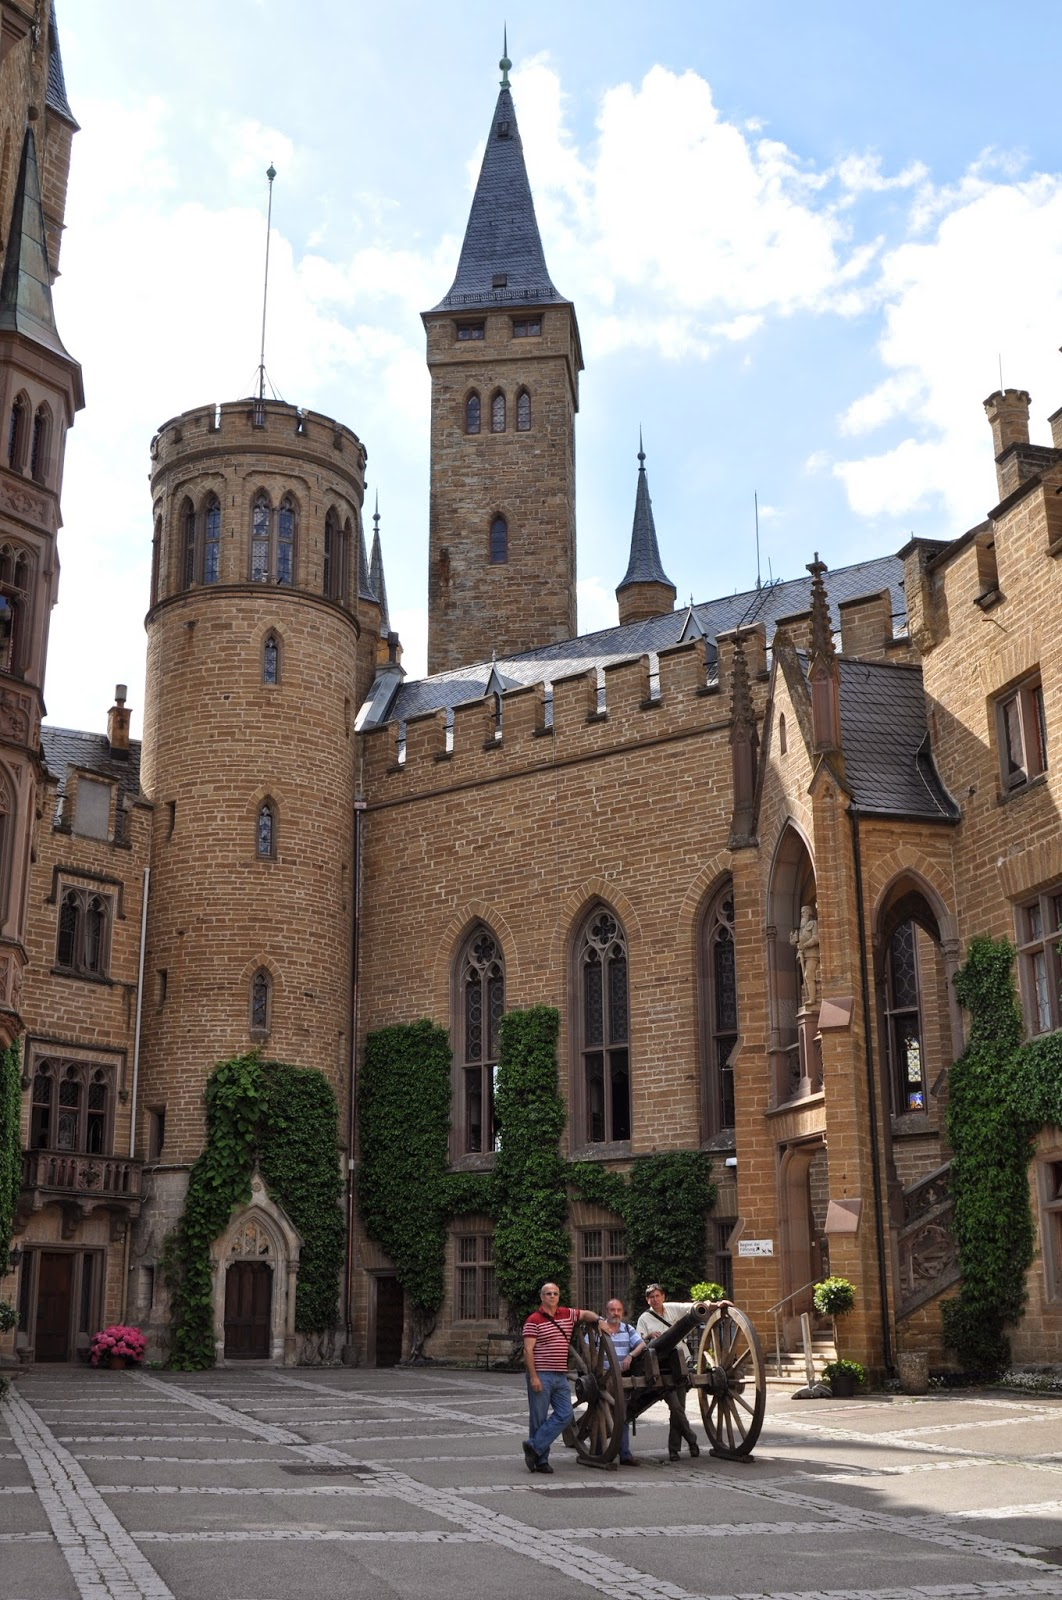 Fotos del Castillo de Hohenzollern